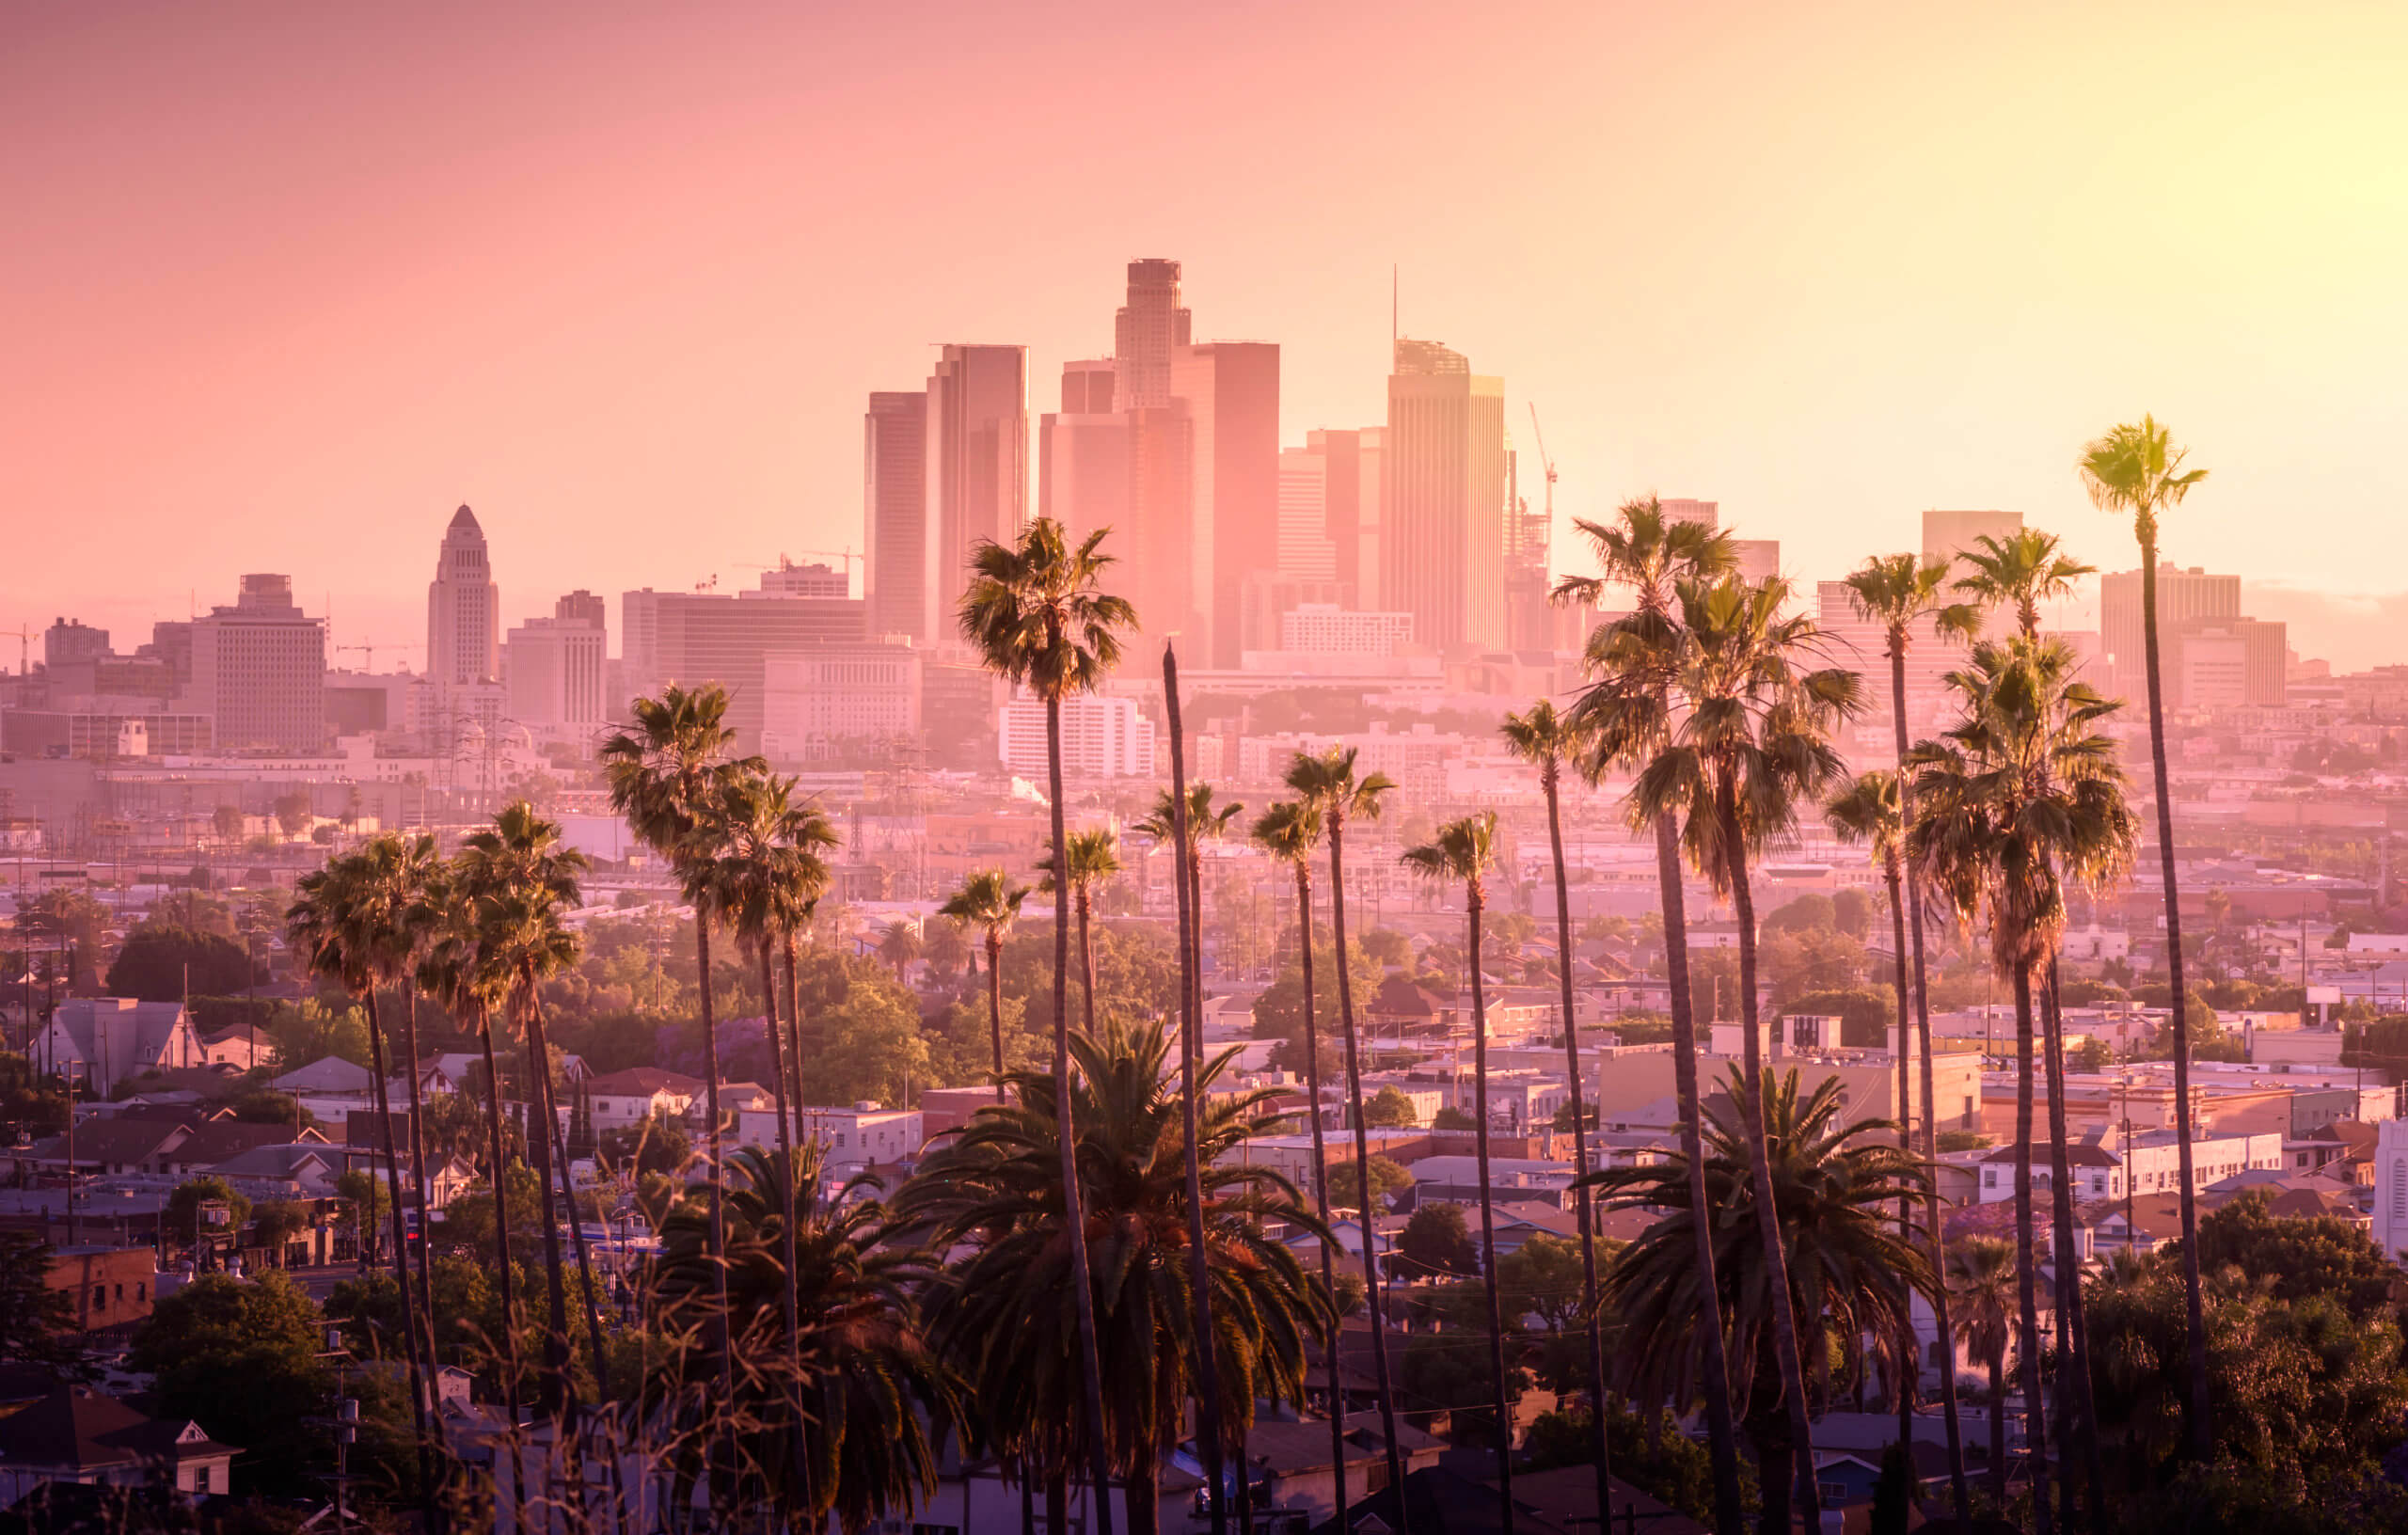 LA market in turmoil; will city of LA respond?